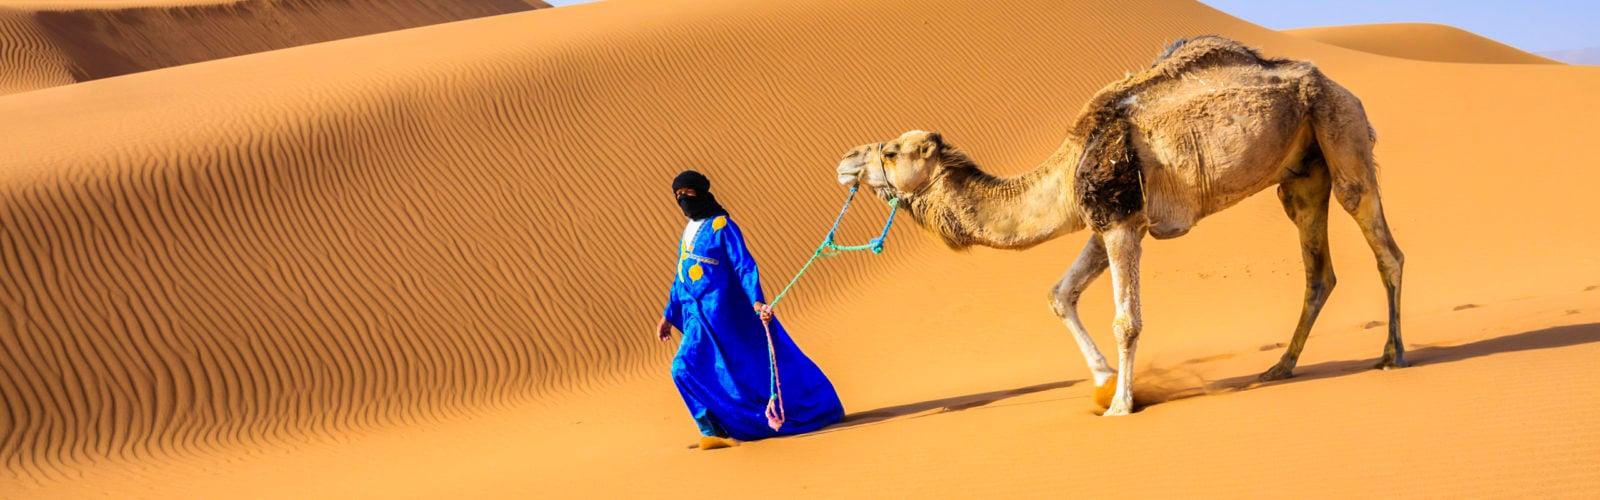 tuareg-camels-morocco